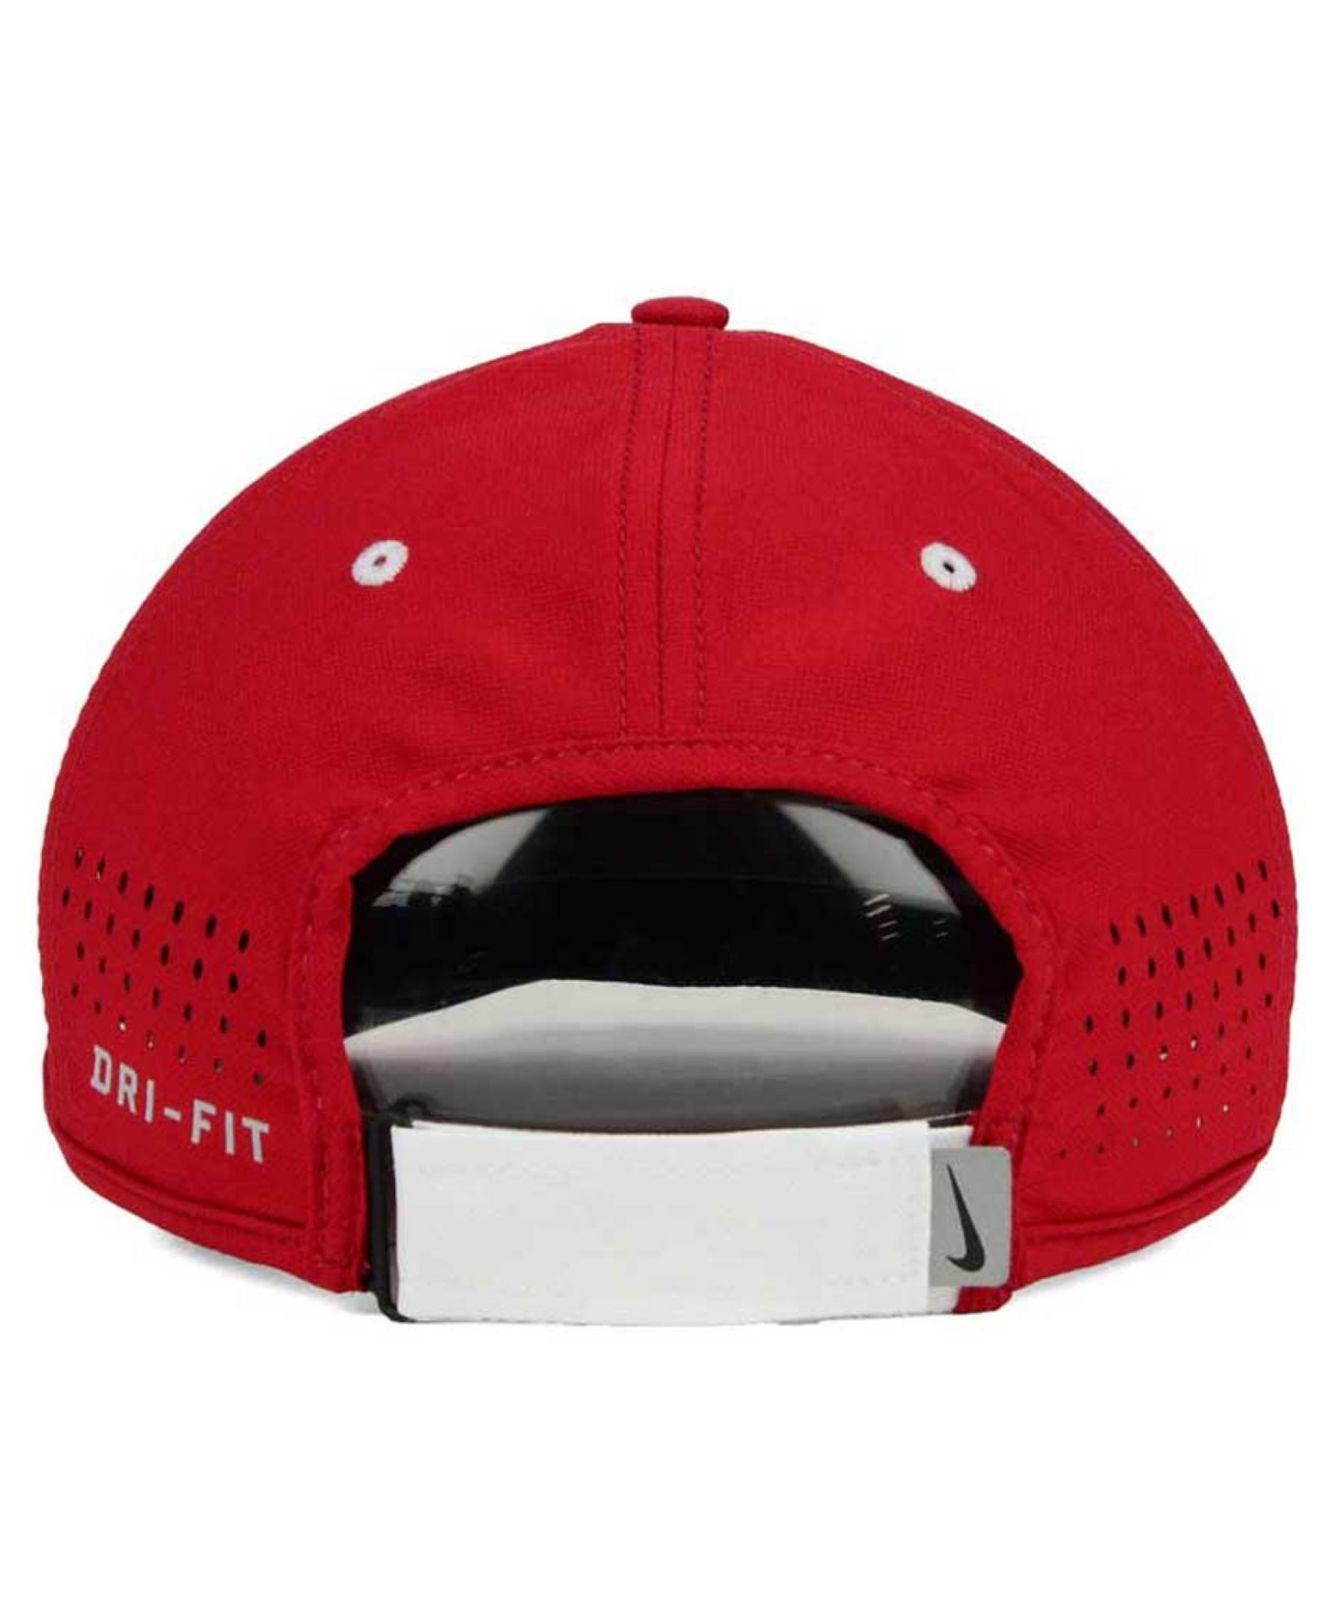 best price lyst nike stanford cardinal dri fit coaches cap in red for men  89a9a d03eb 587c20328e47